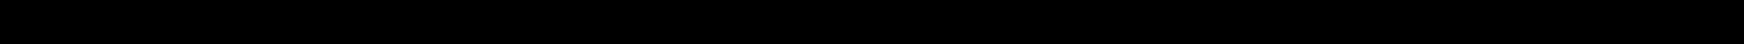 Neutra2TextGreek-Bold.otf